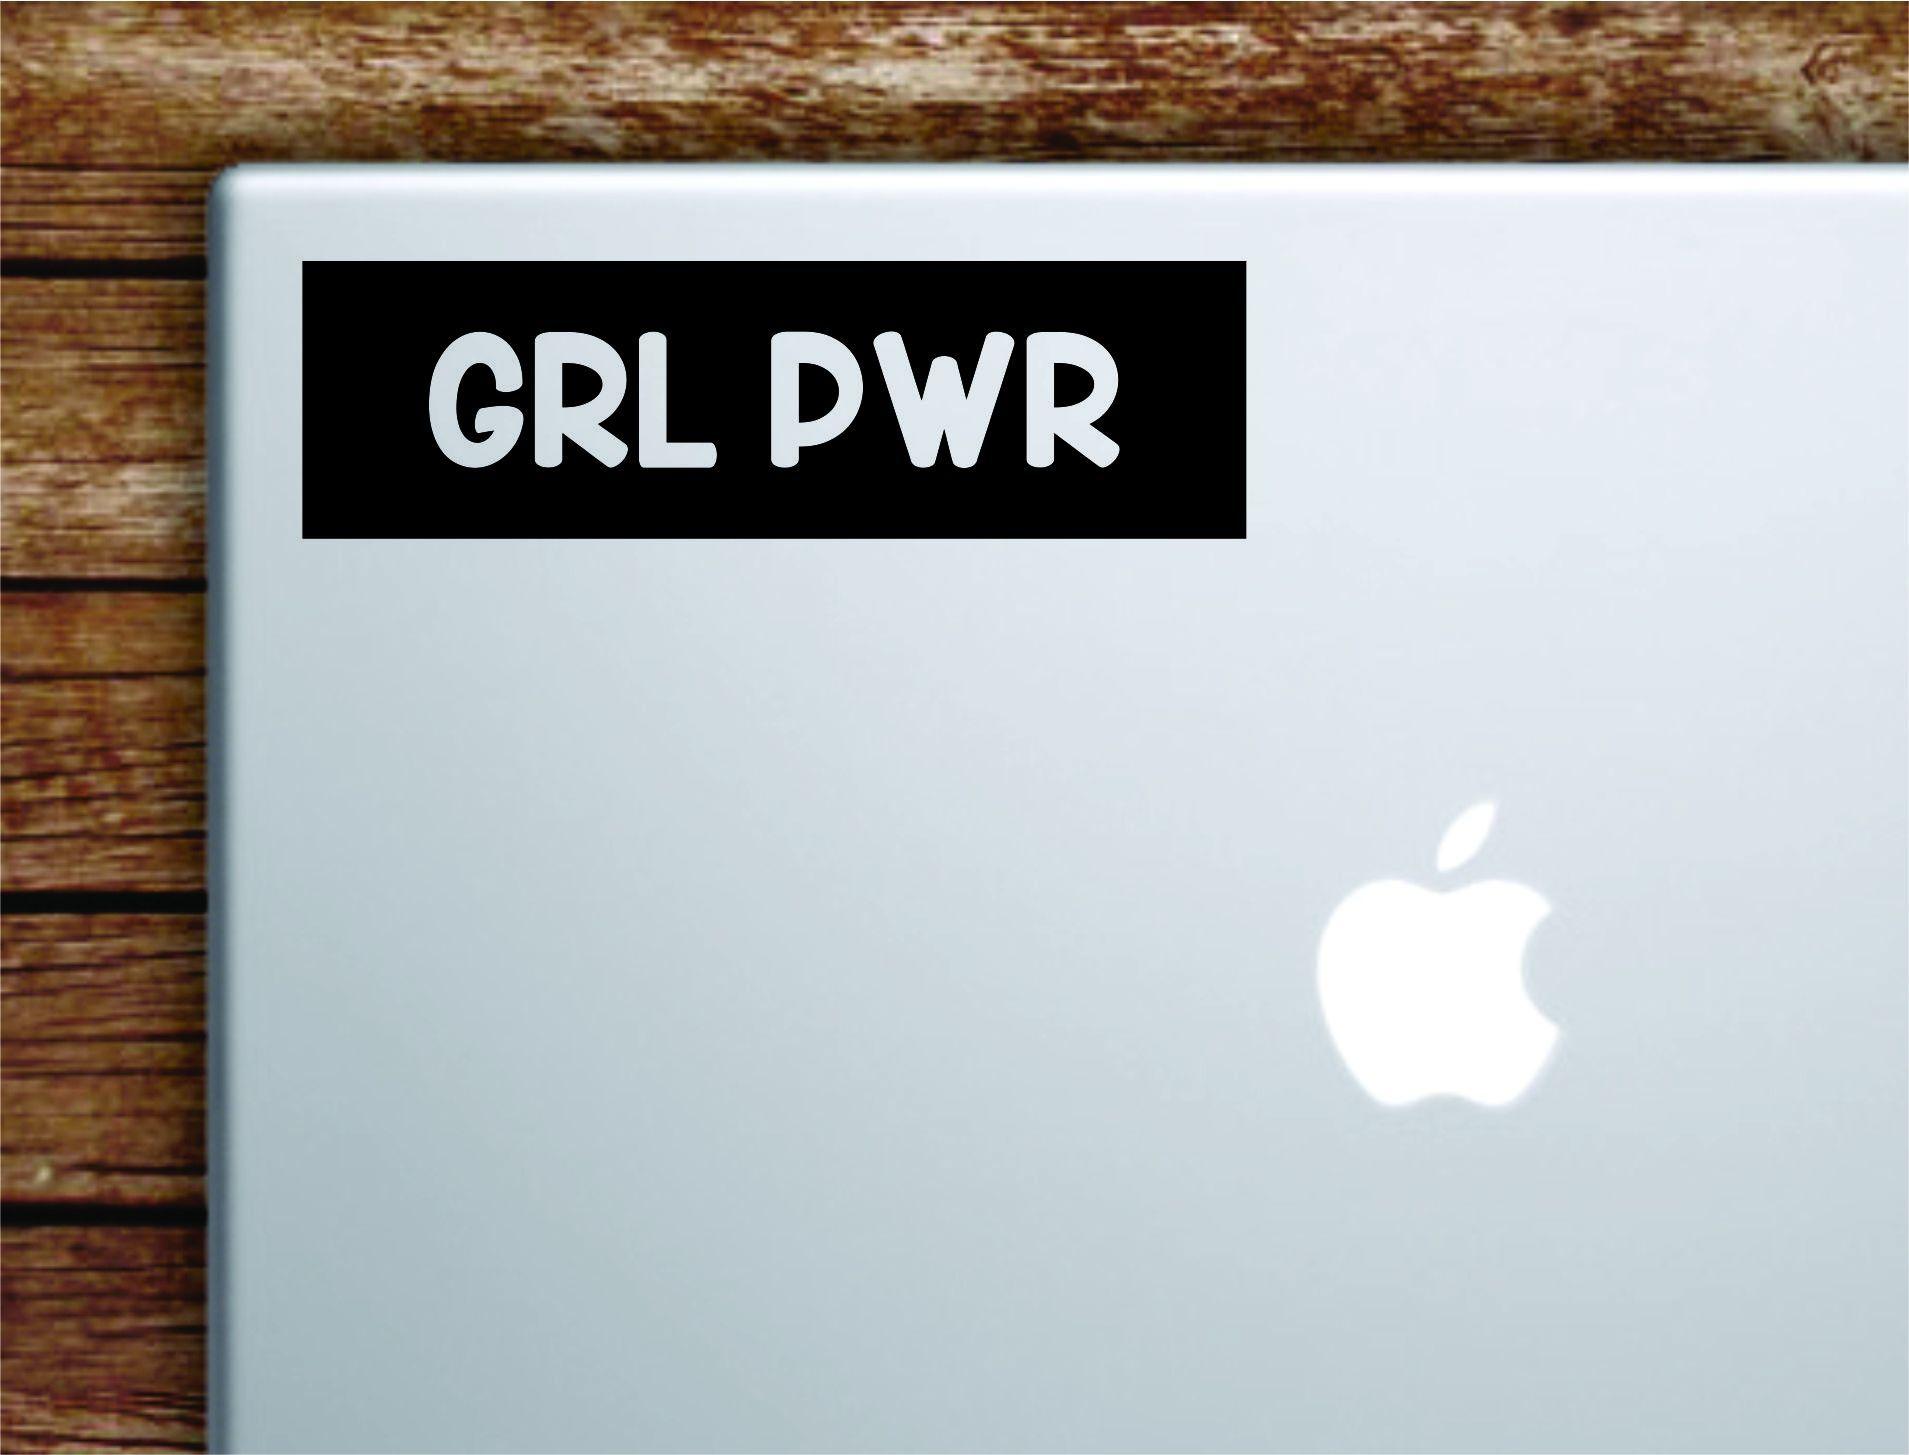 GRL PWR Rectangle Laptop Apple Macbook Quote Wall Decal Sticker Art Vinyl Inspirational Motivational Girls Women Female Feminist Feminist - orange